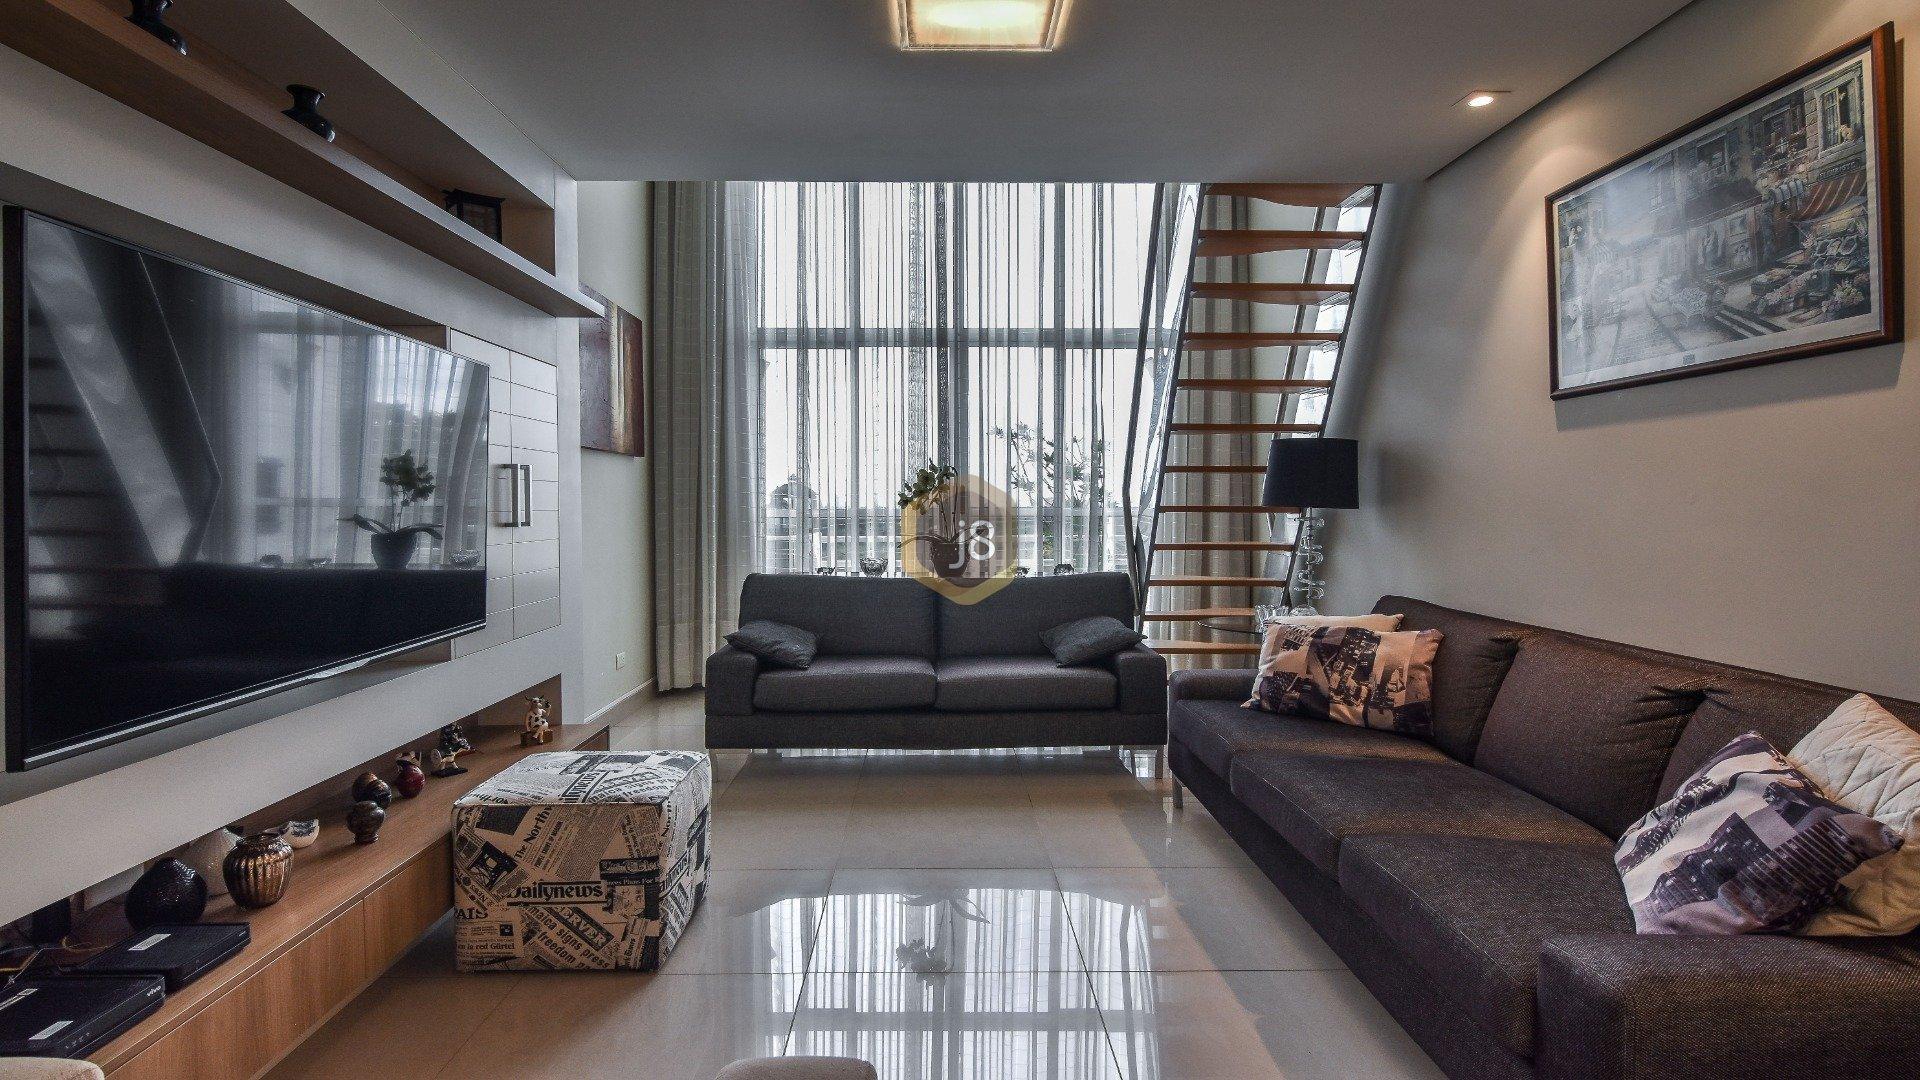 Foto de destaque Apartamento clean e na medida certa!